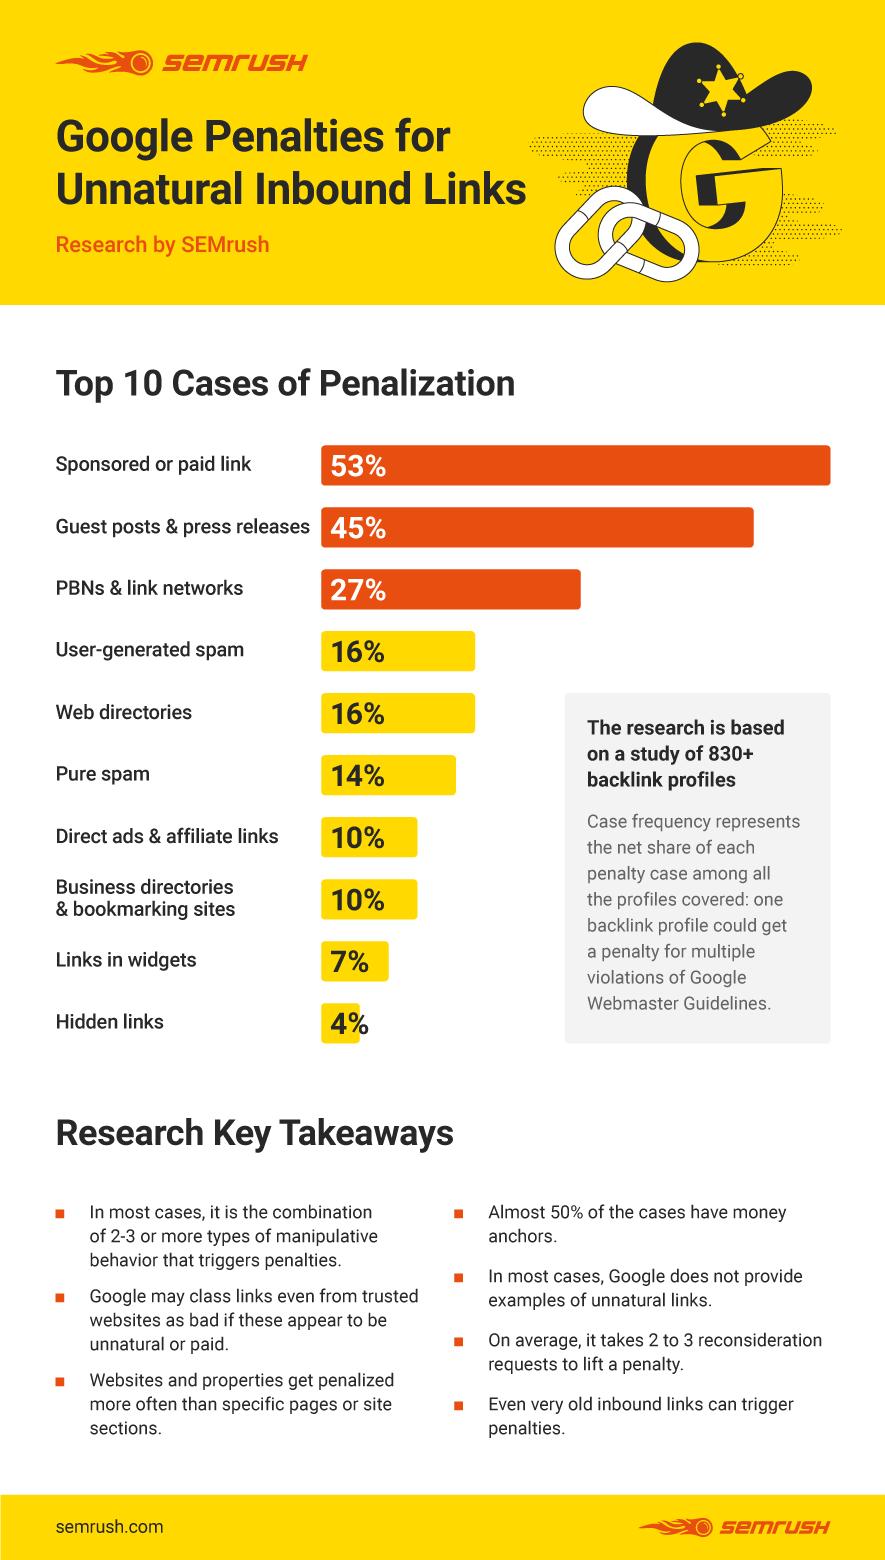 Andres SEO Expert Blog   SEMrush Blog: Top 10 Cases of Penalization